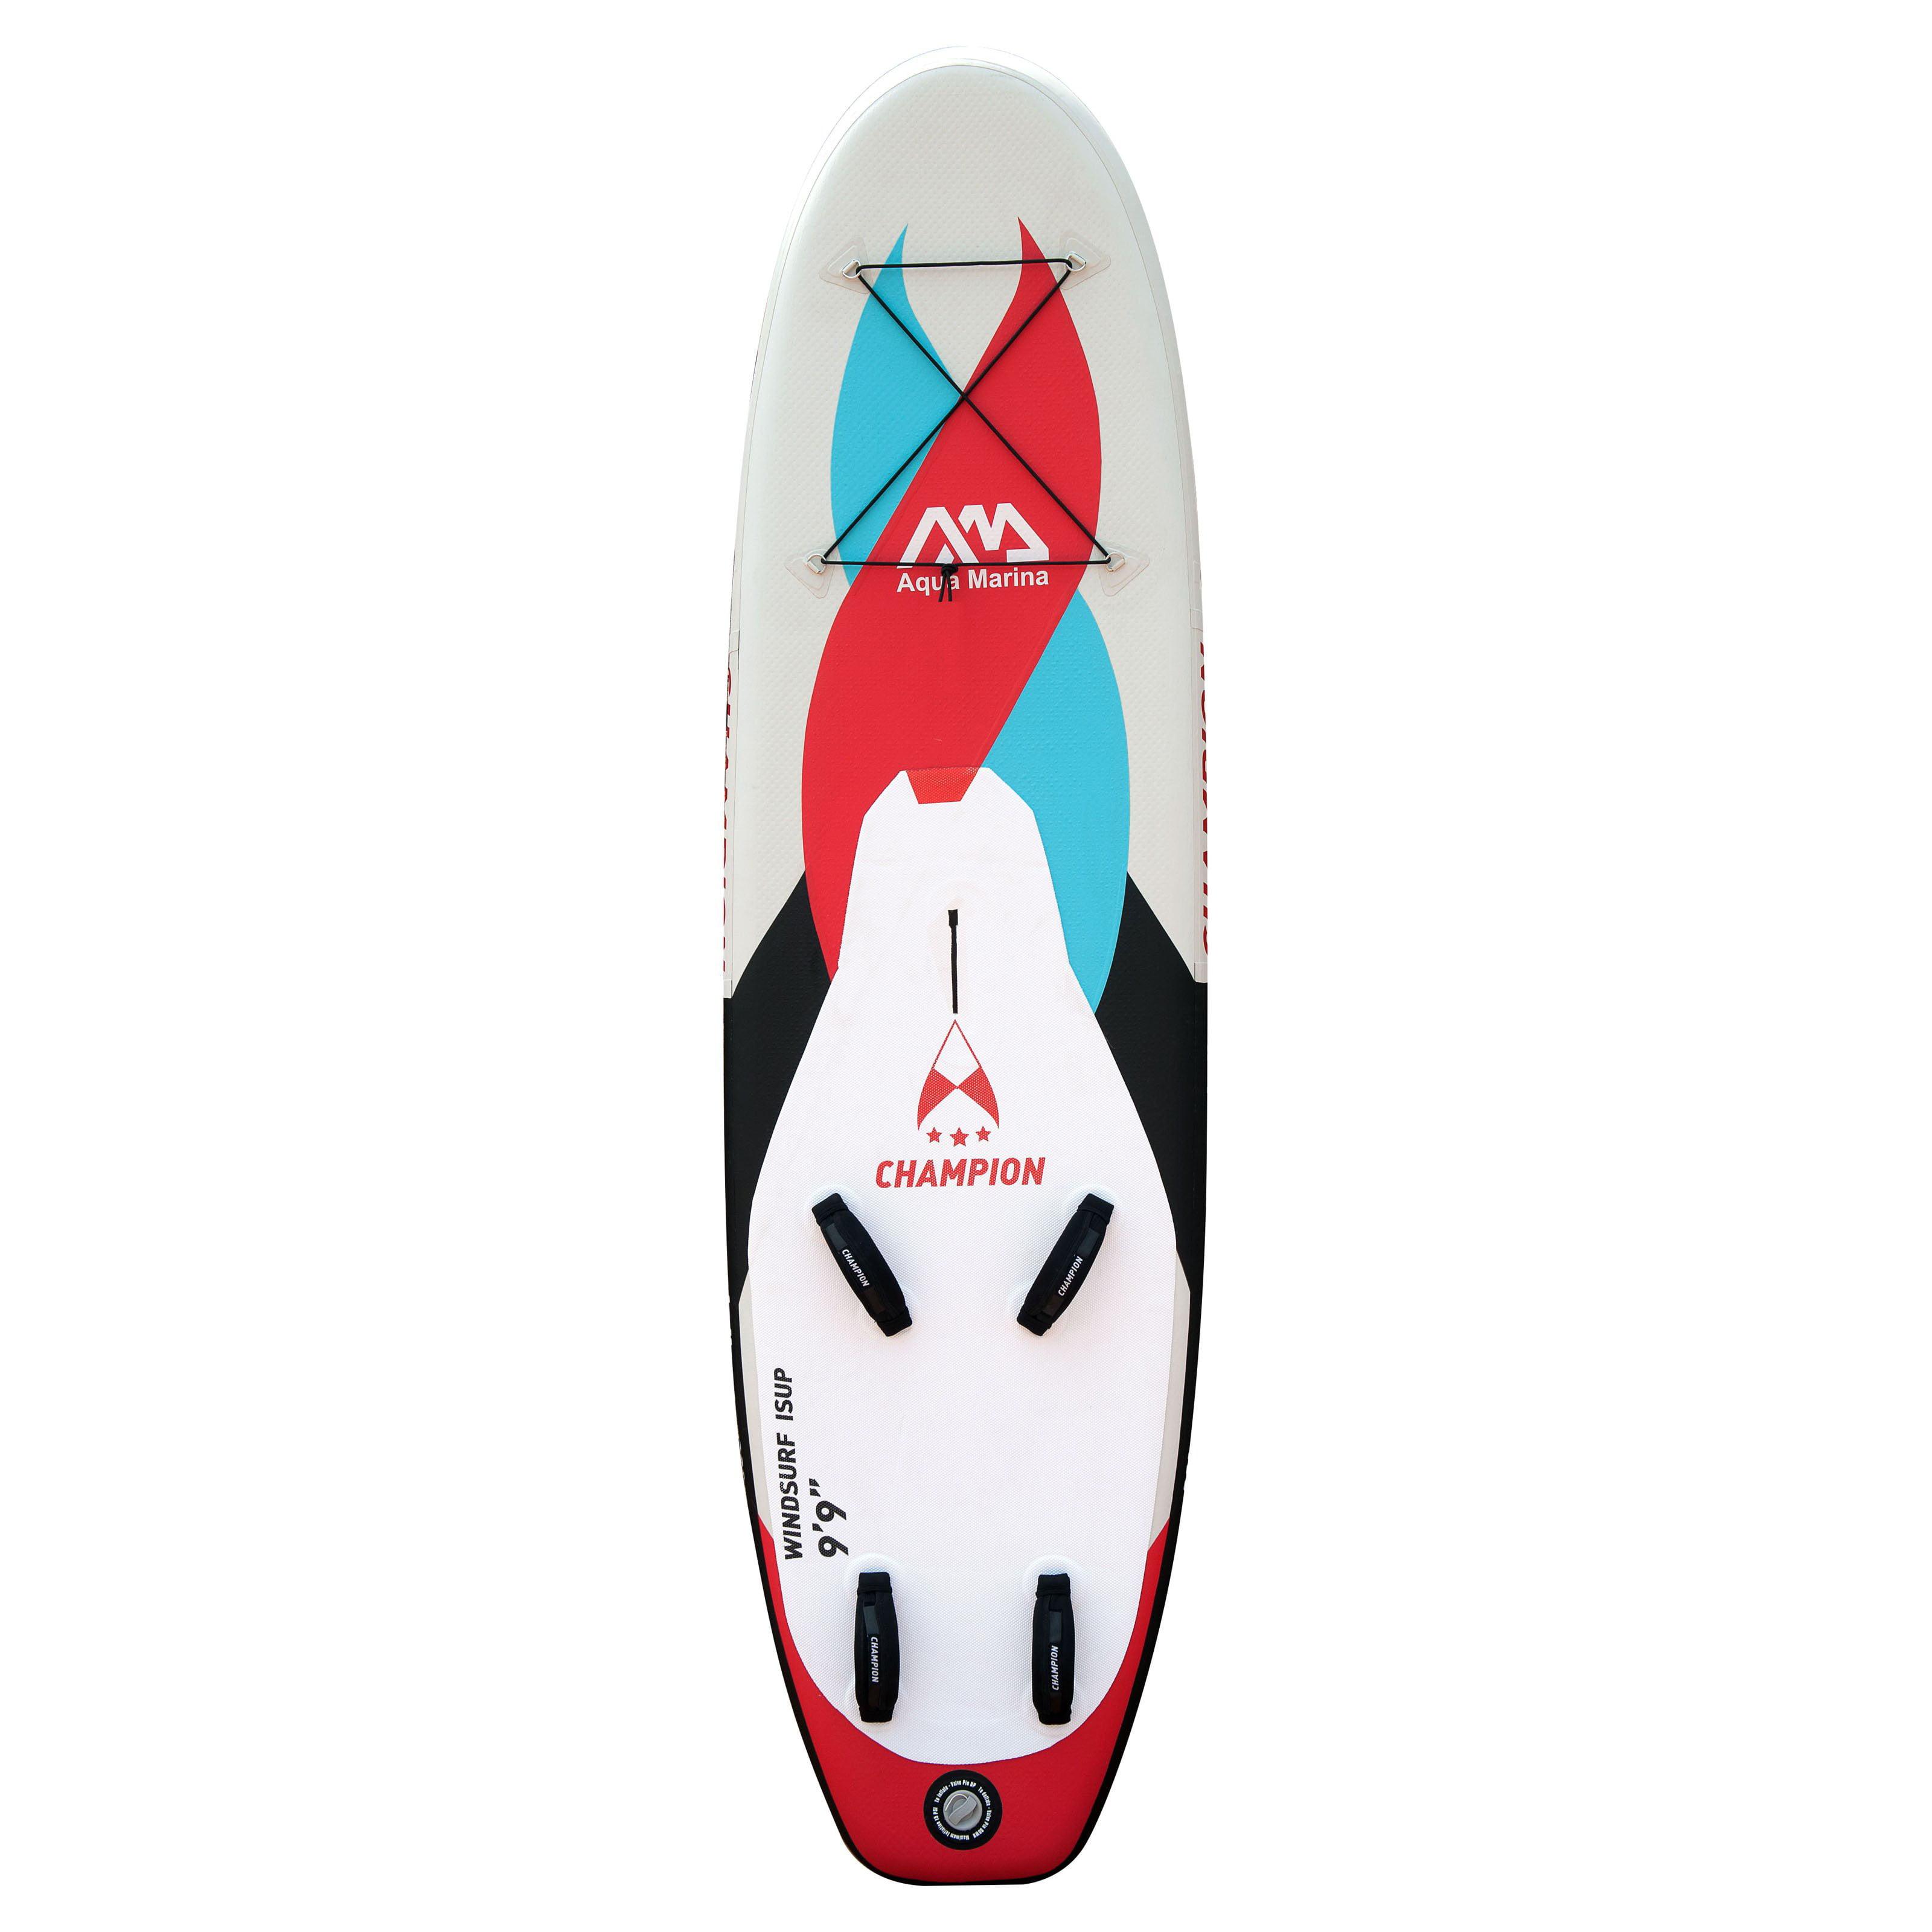 Aqua Marina Champion Windsurfing Stand Up Paddle Board by Aqua Marina